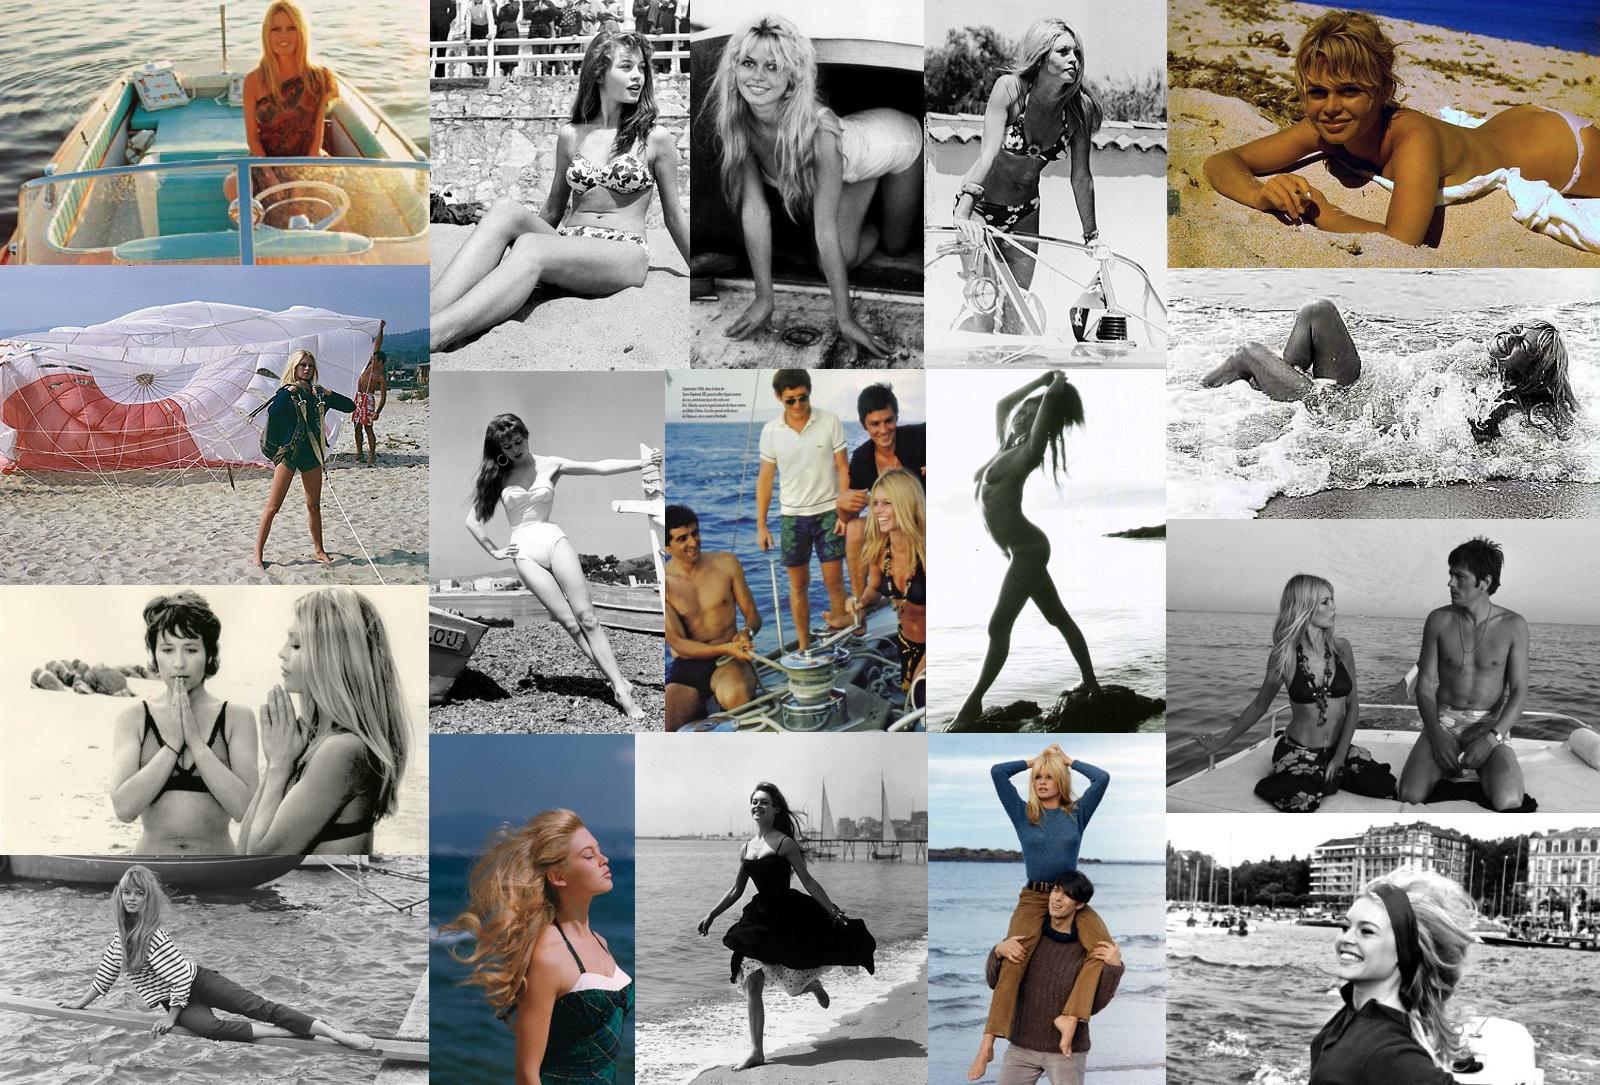 http://4.bp.blogspot.com/-hojxtDWmDAs/TfJ233xkqyI/AAAAAAAACqg/BNZNqkft6ic/s1600/Brigitte+Bardot_ocean.jpg